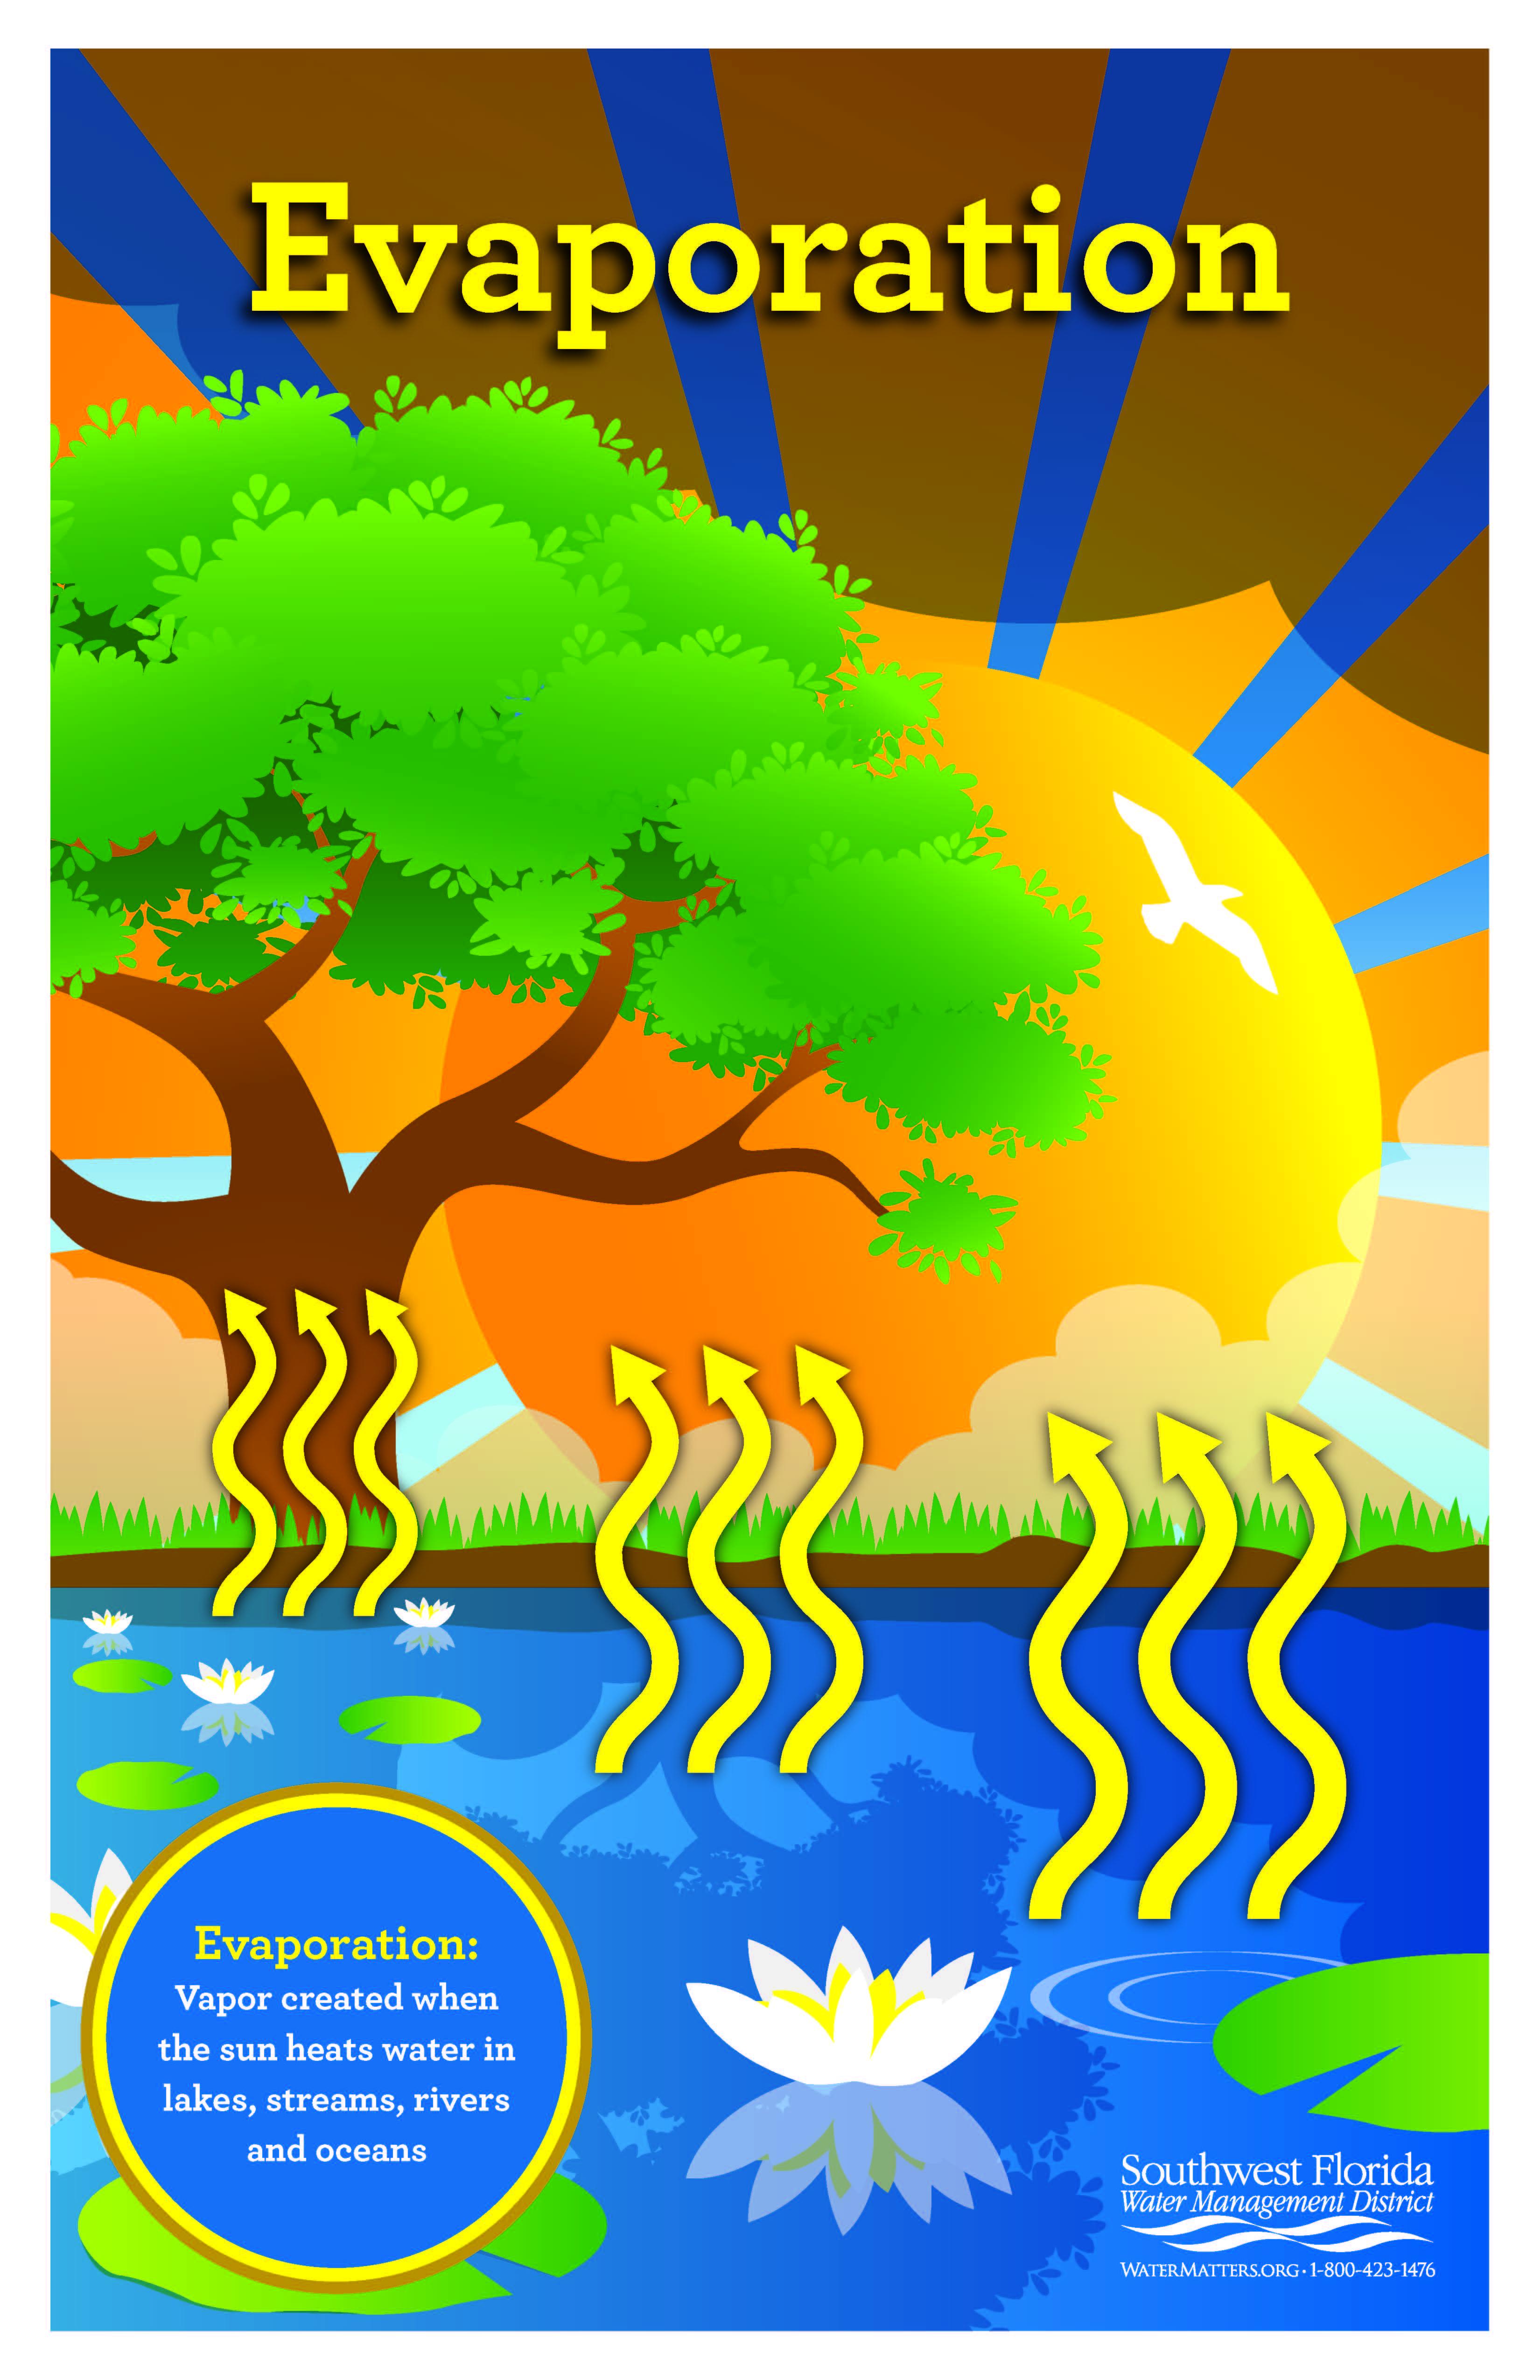 Order Or Download An Evaporation Poster